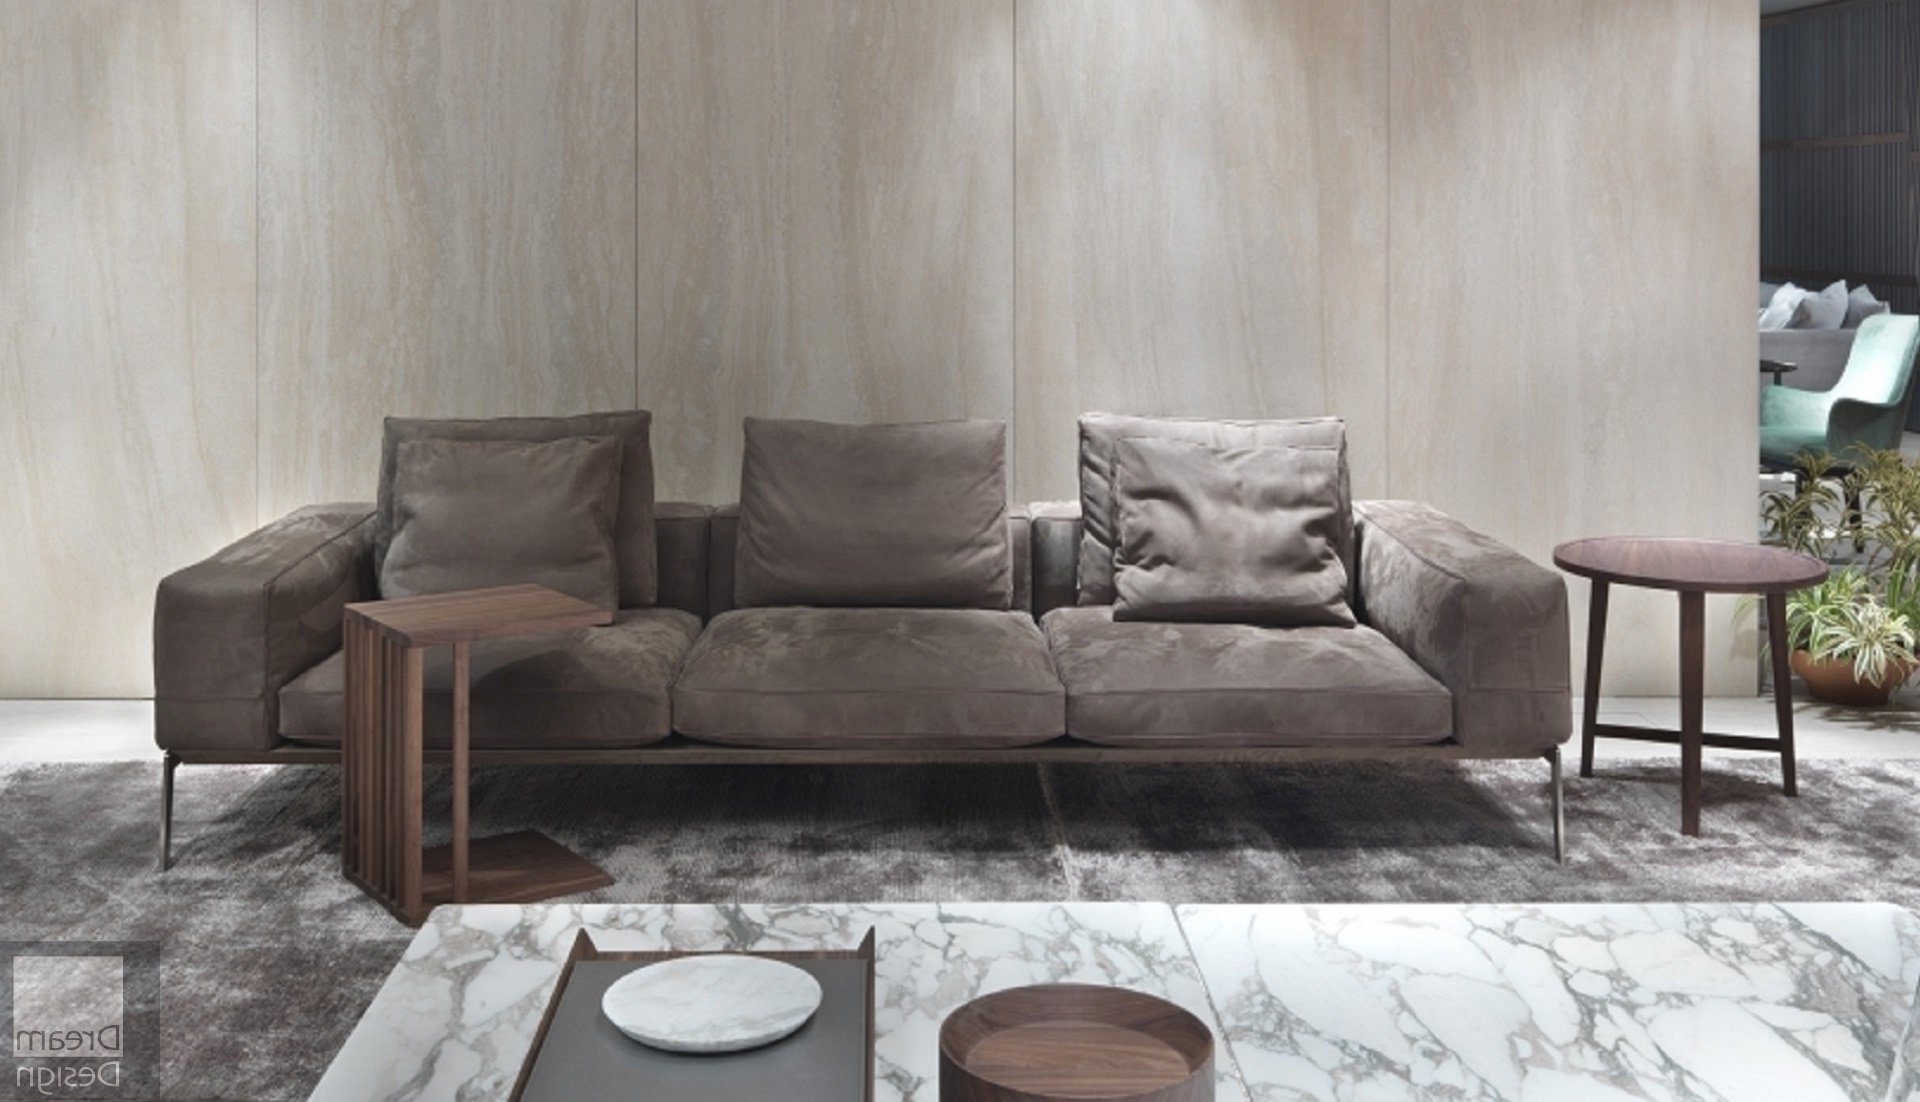 Flexform Lifesteel Sofaantonio Citterio – Everthing But Ordinary Inside Fashionable Flexform Sofas (View 14 of 15)